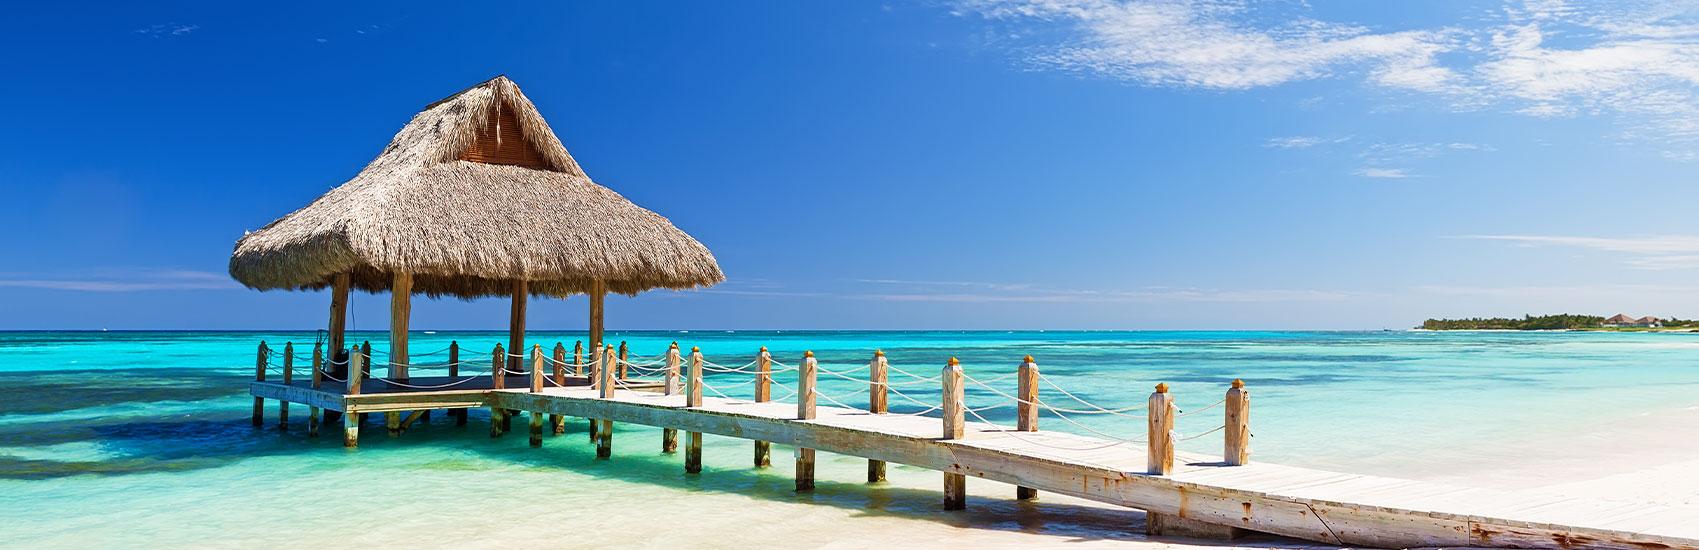 Transat Vacation Offers